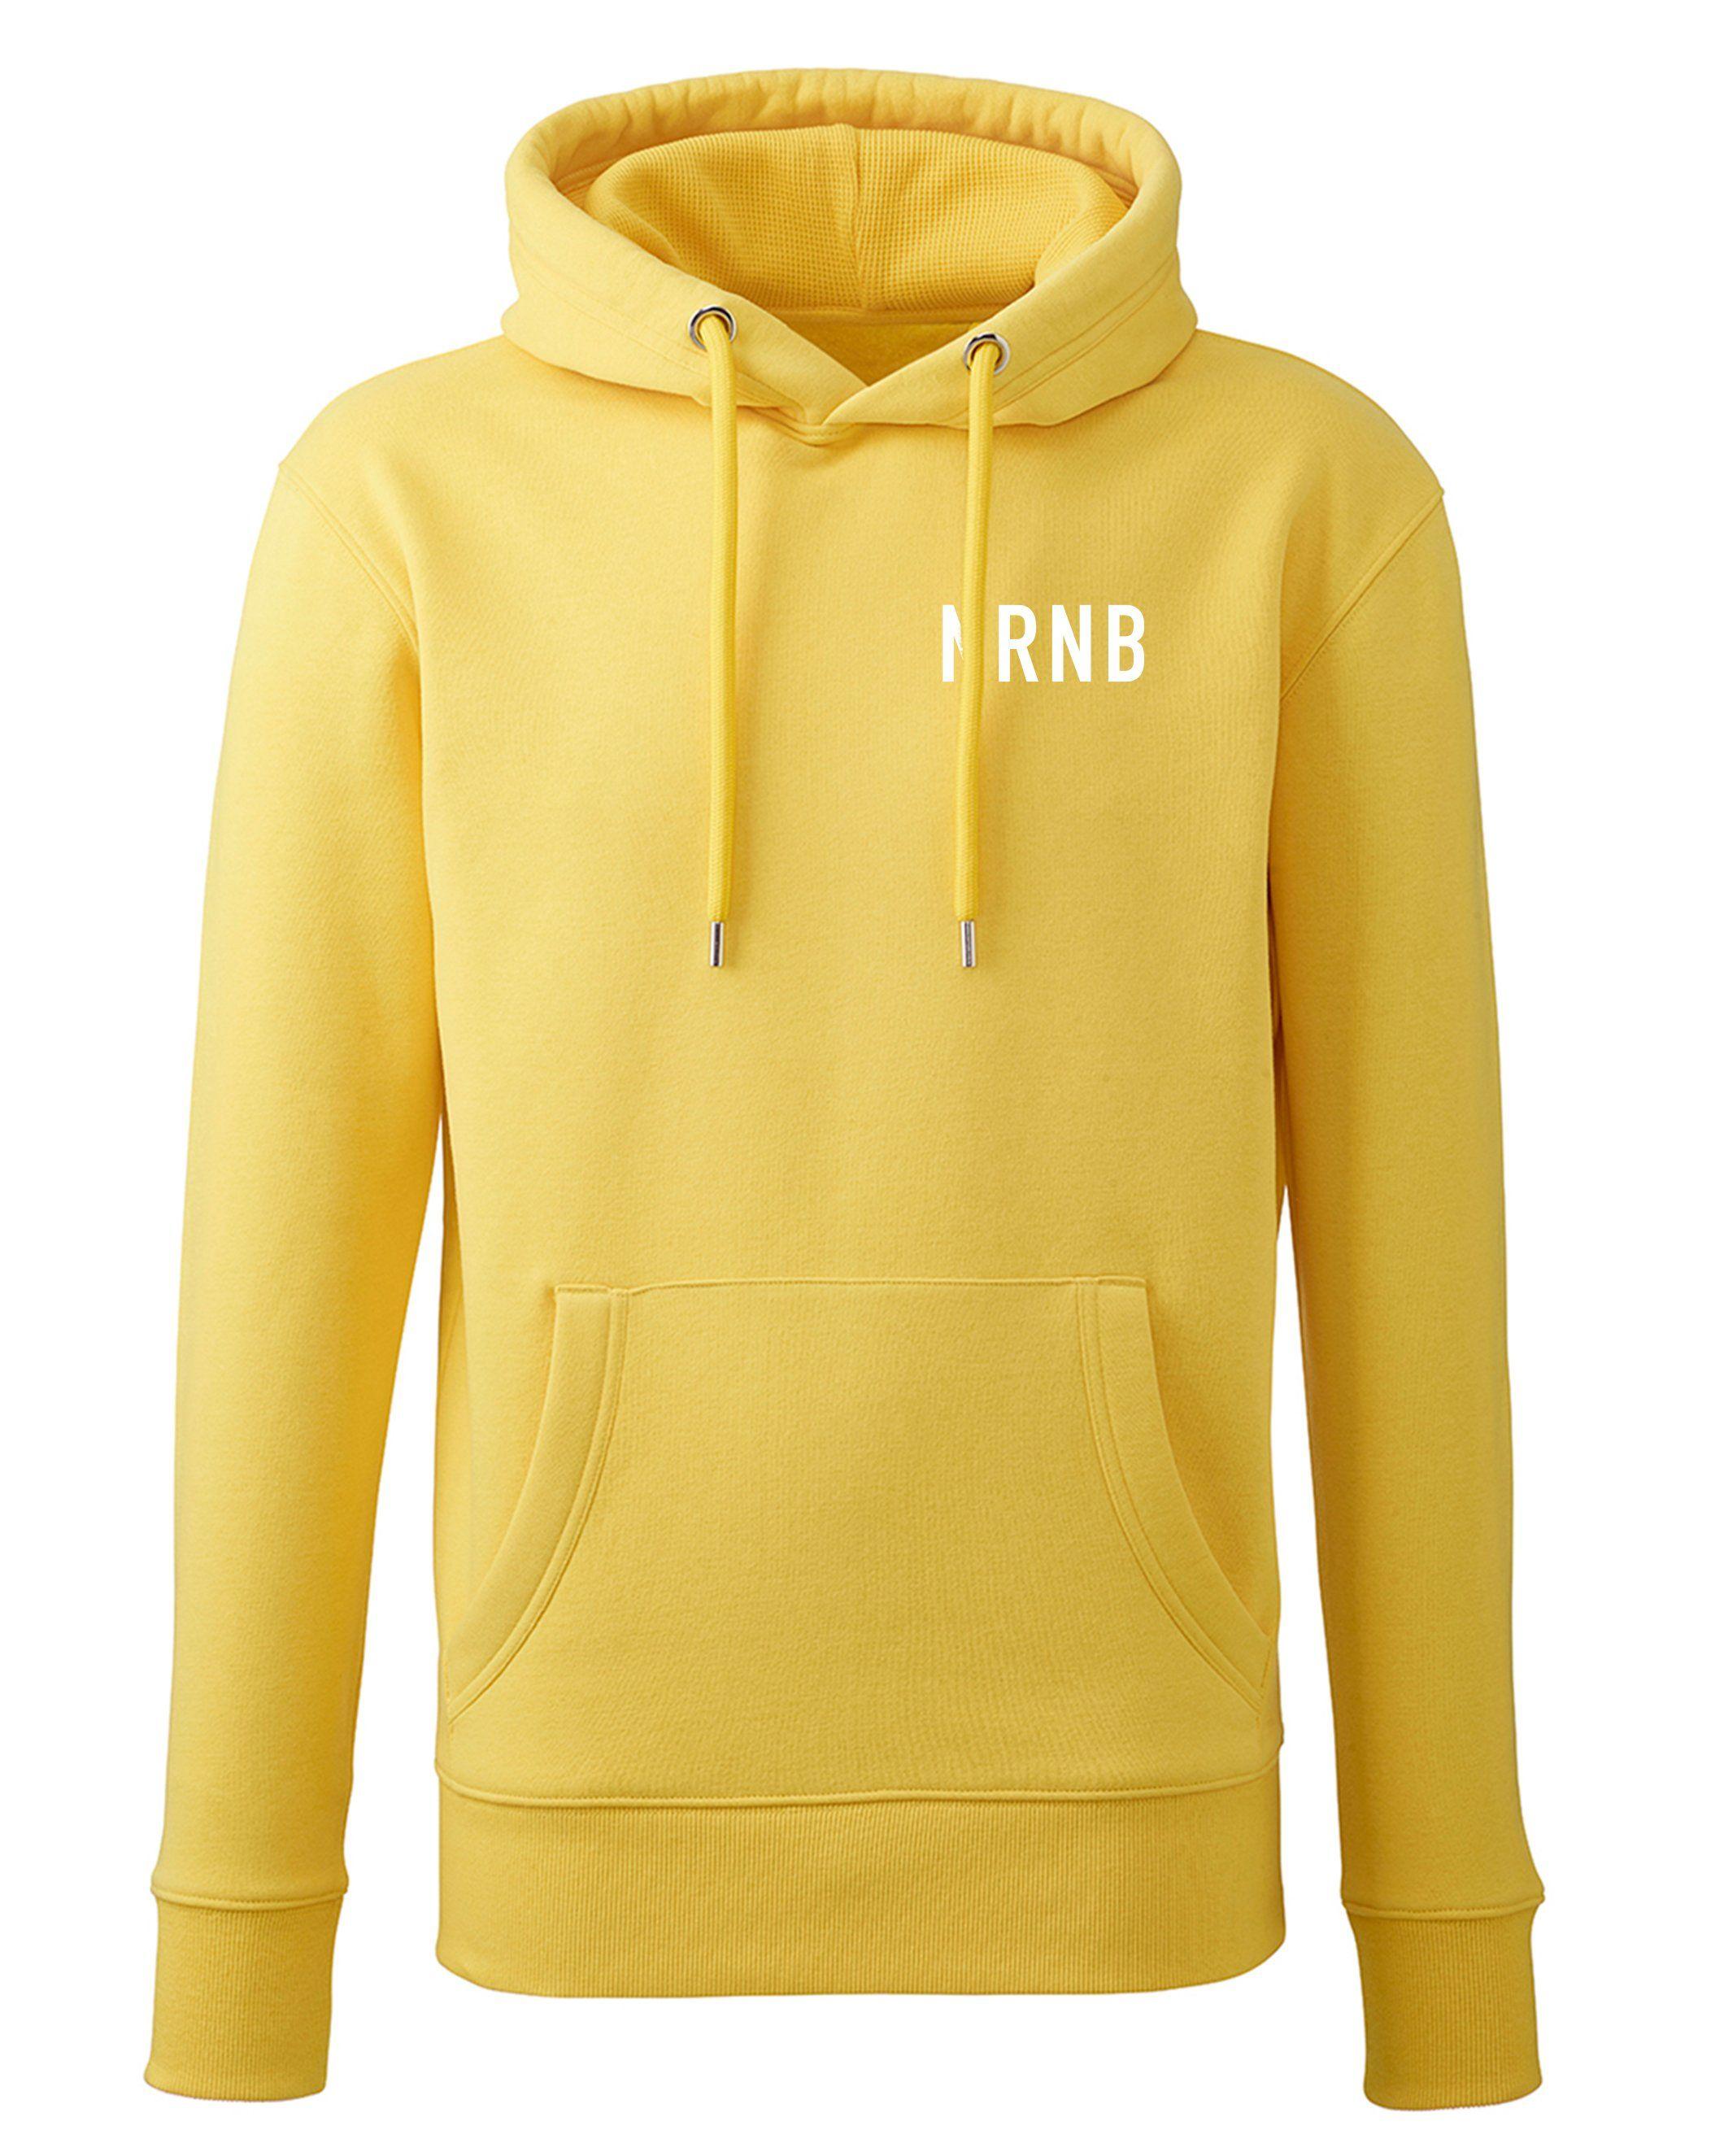 White Label Hood - Yellow